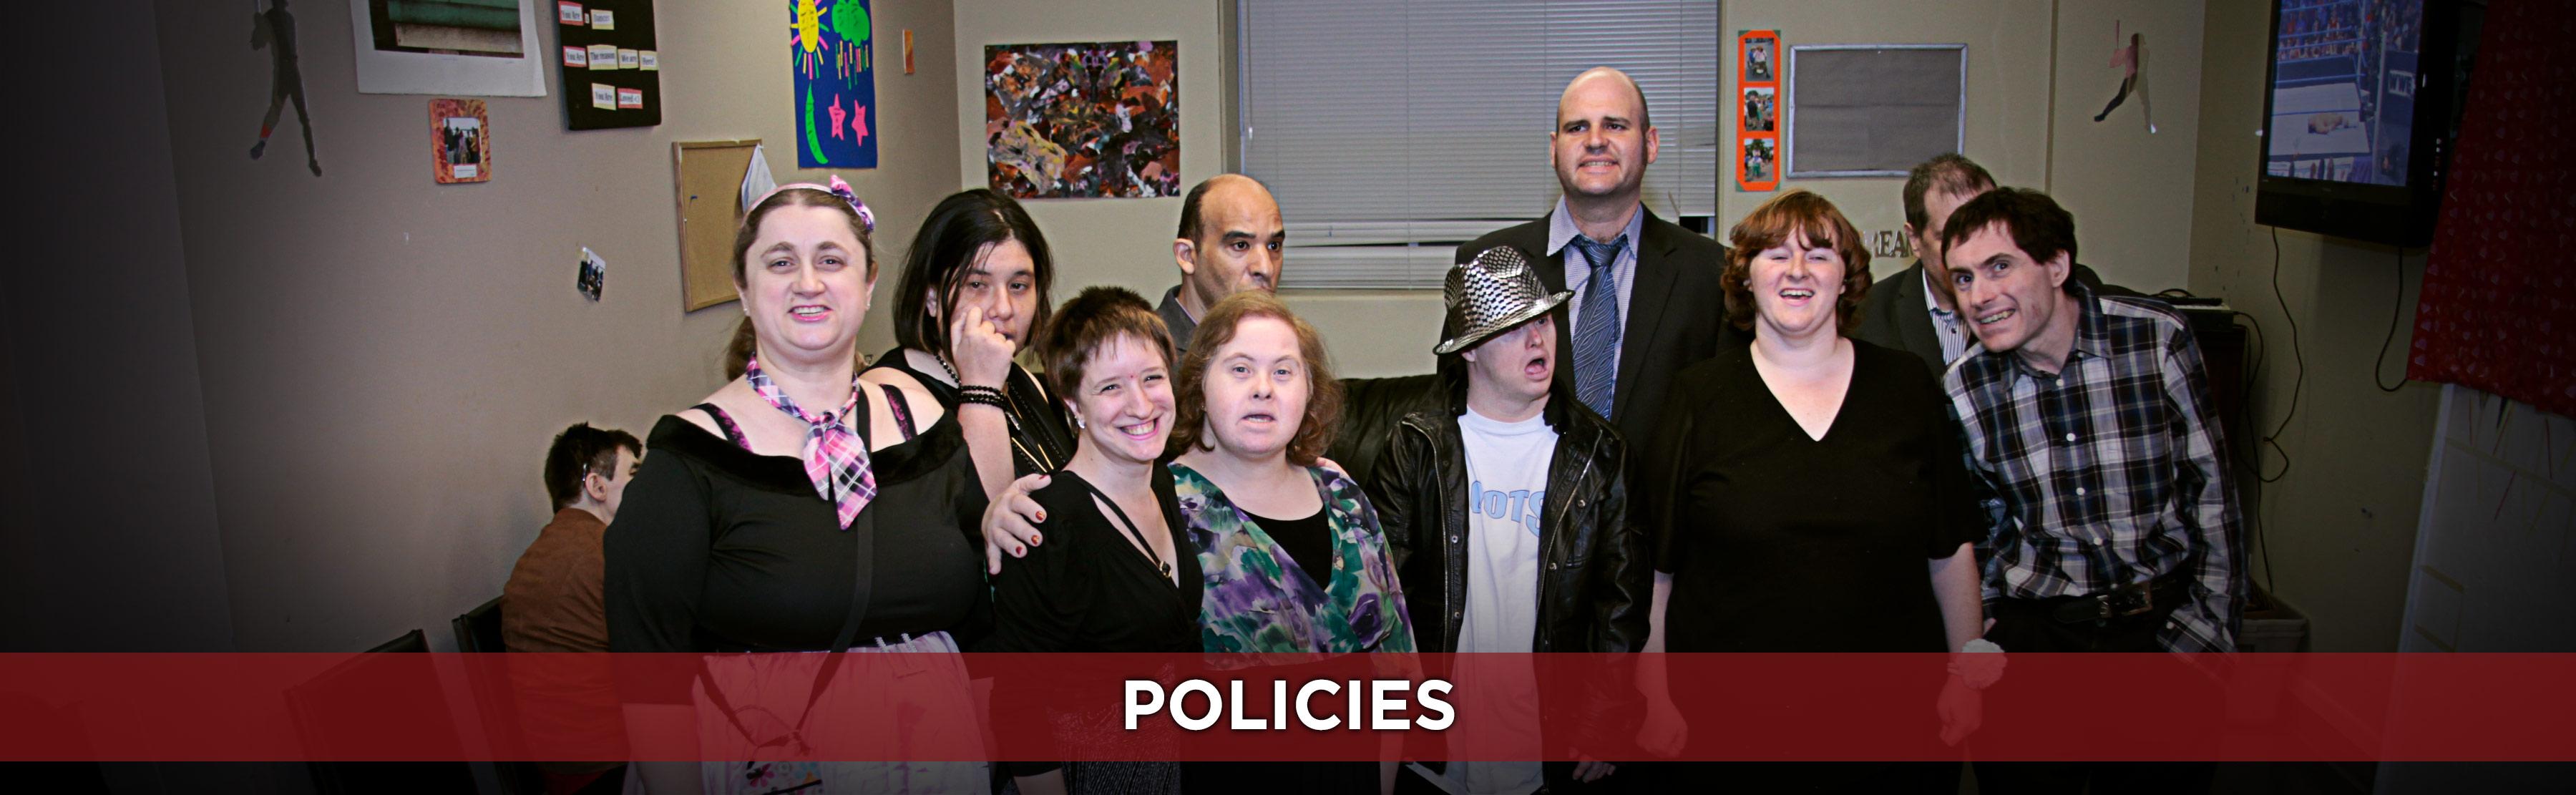 After Porn Ends Reparto policies – vita mens sana